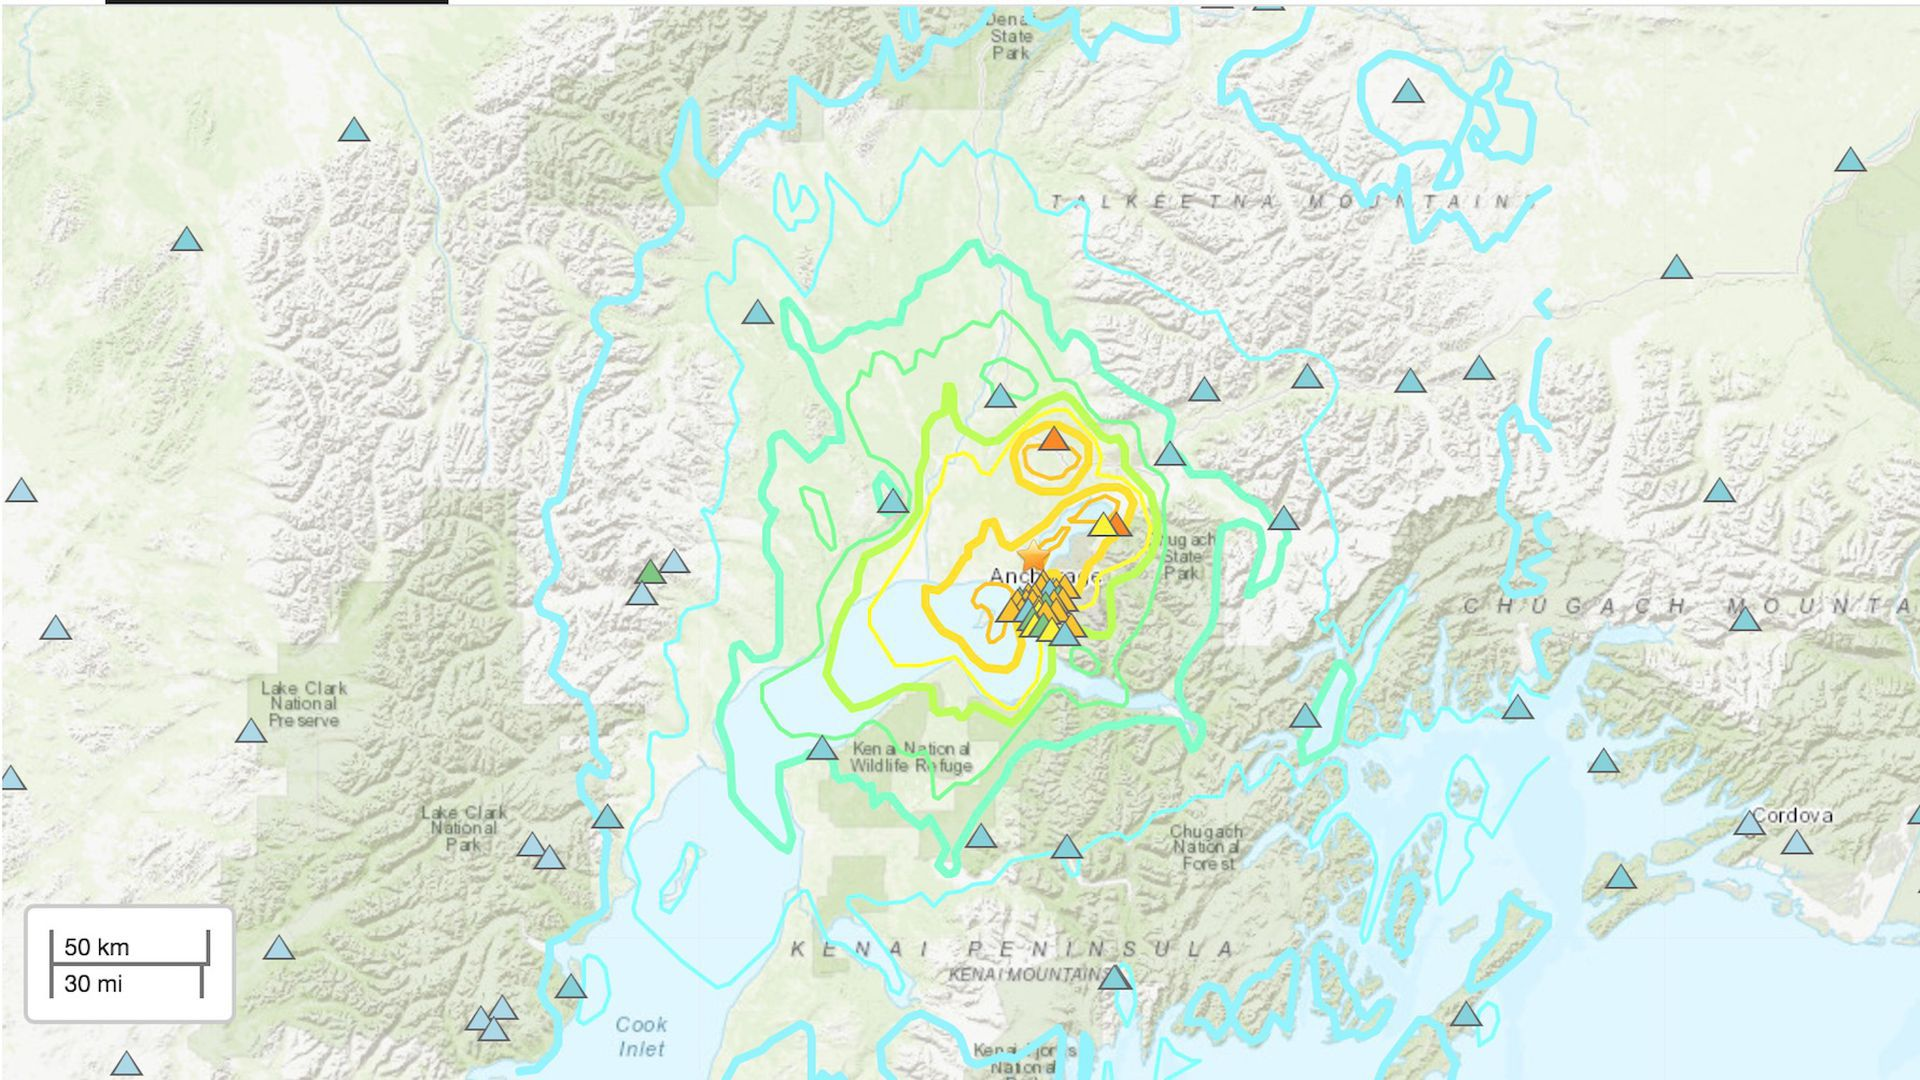 USGS shakemap